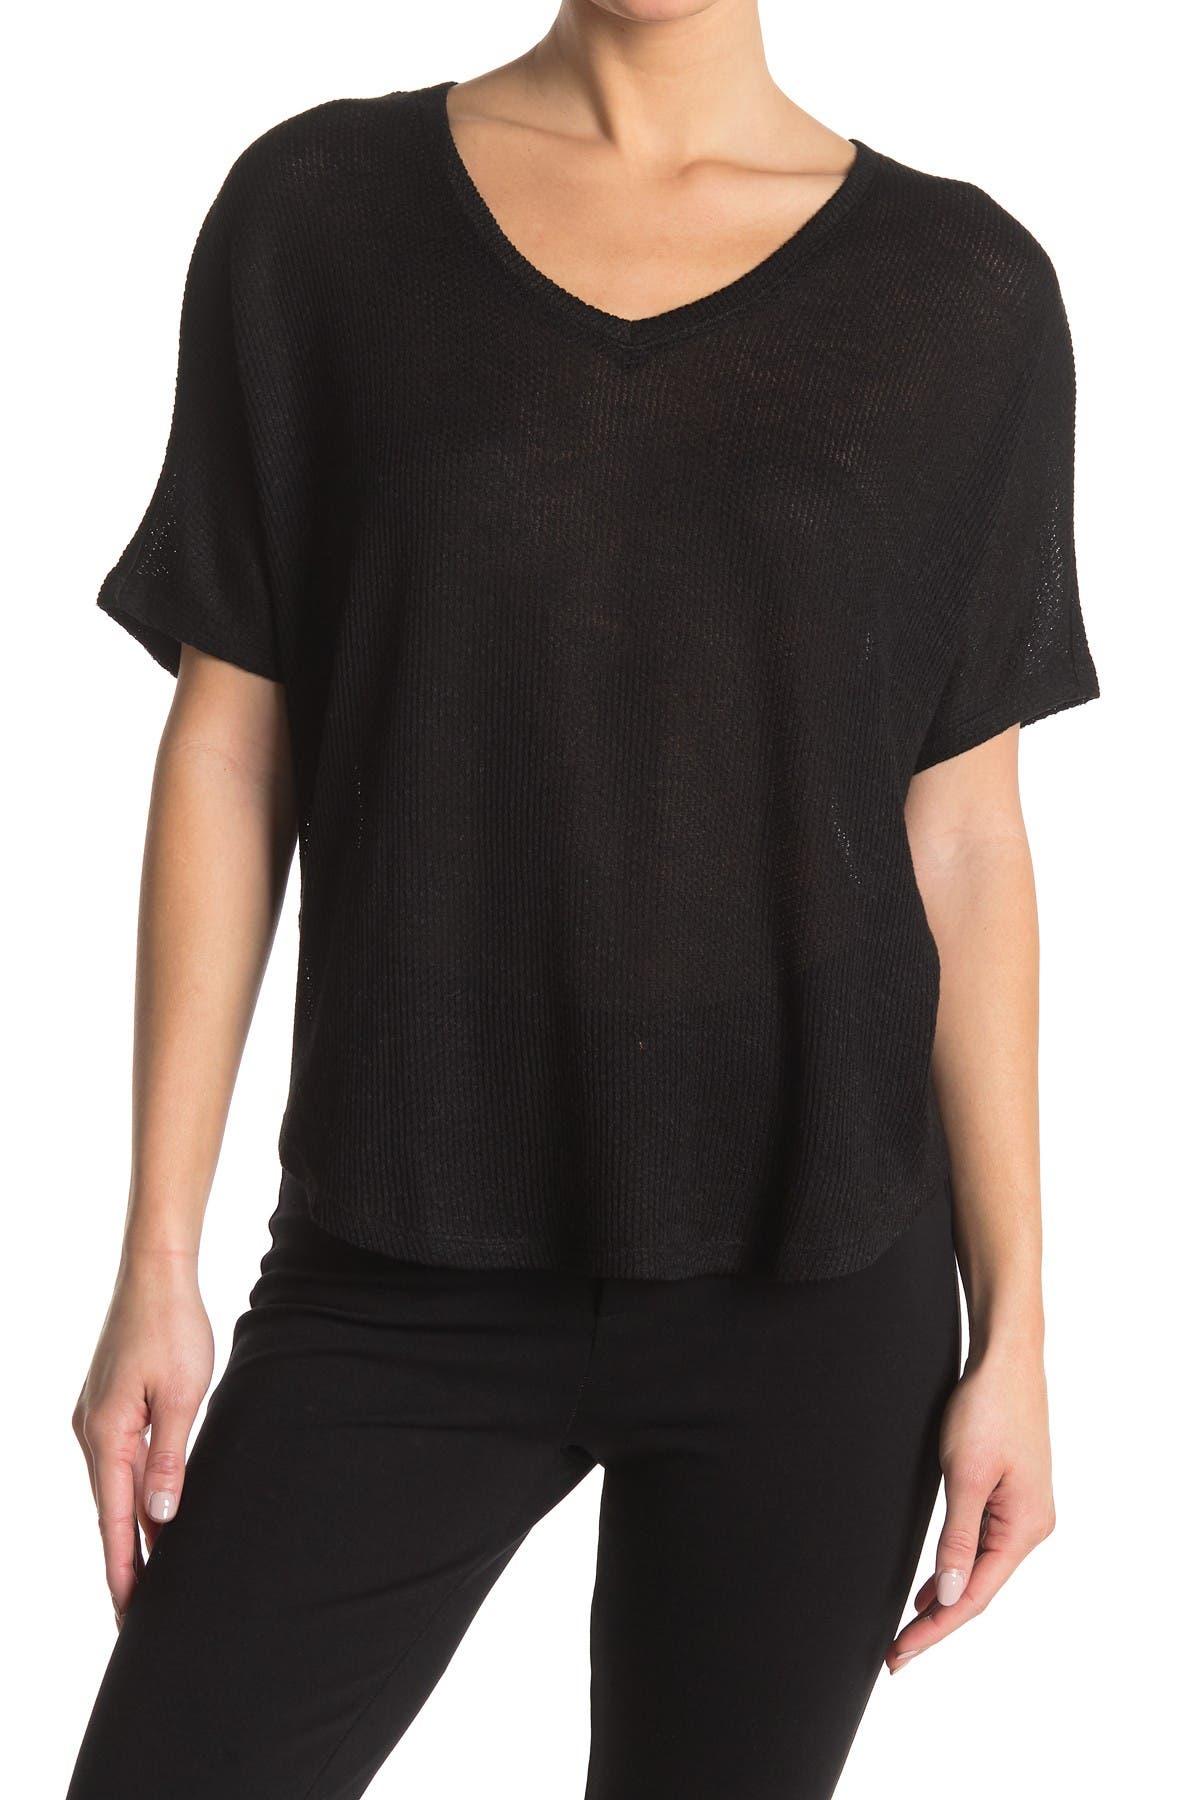 Image of philosophy V-Neck Dolman Sleeve Knit Shirt